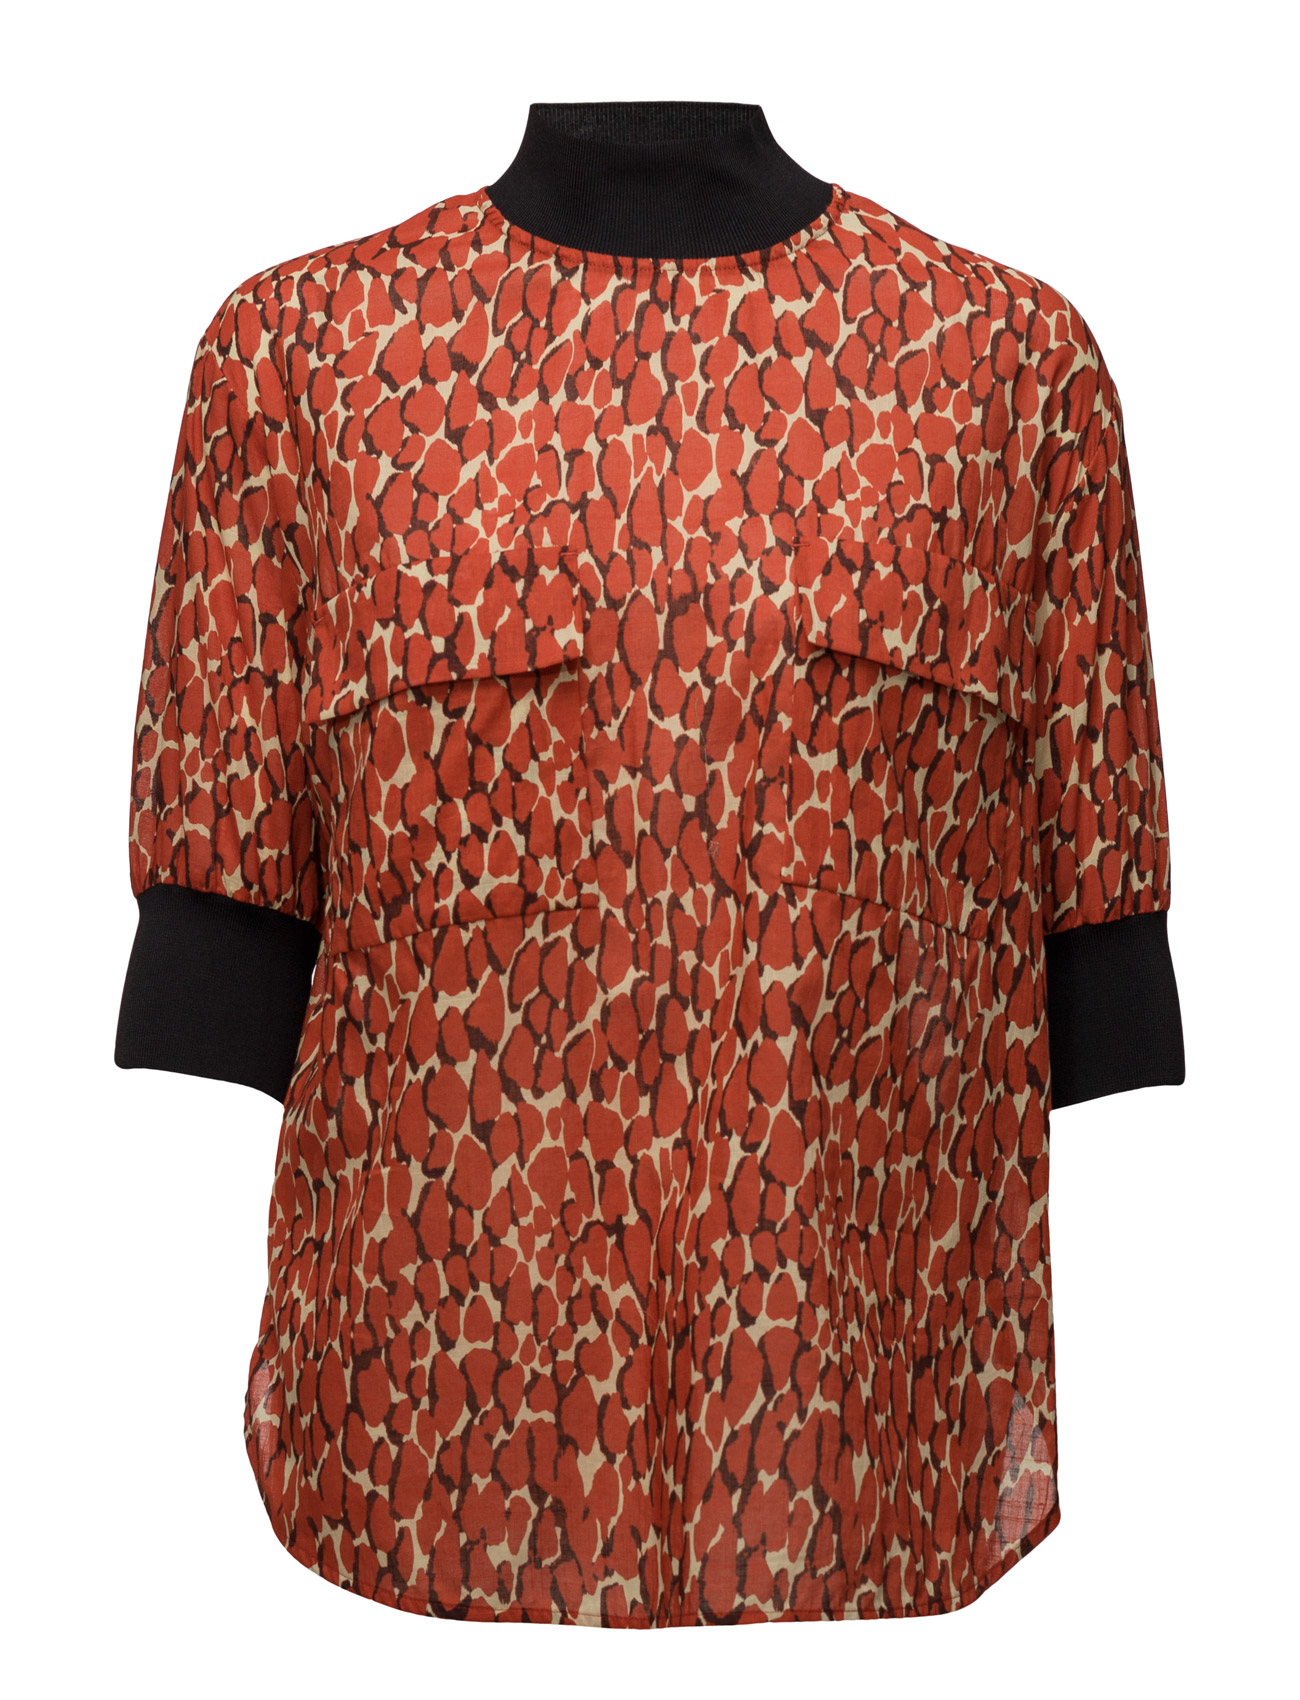 5e92d80fd77 Cobolias (Autumn Red) (138 €) - By Malene Birger - T-Shirts & Tops ...